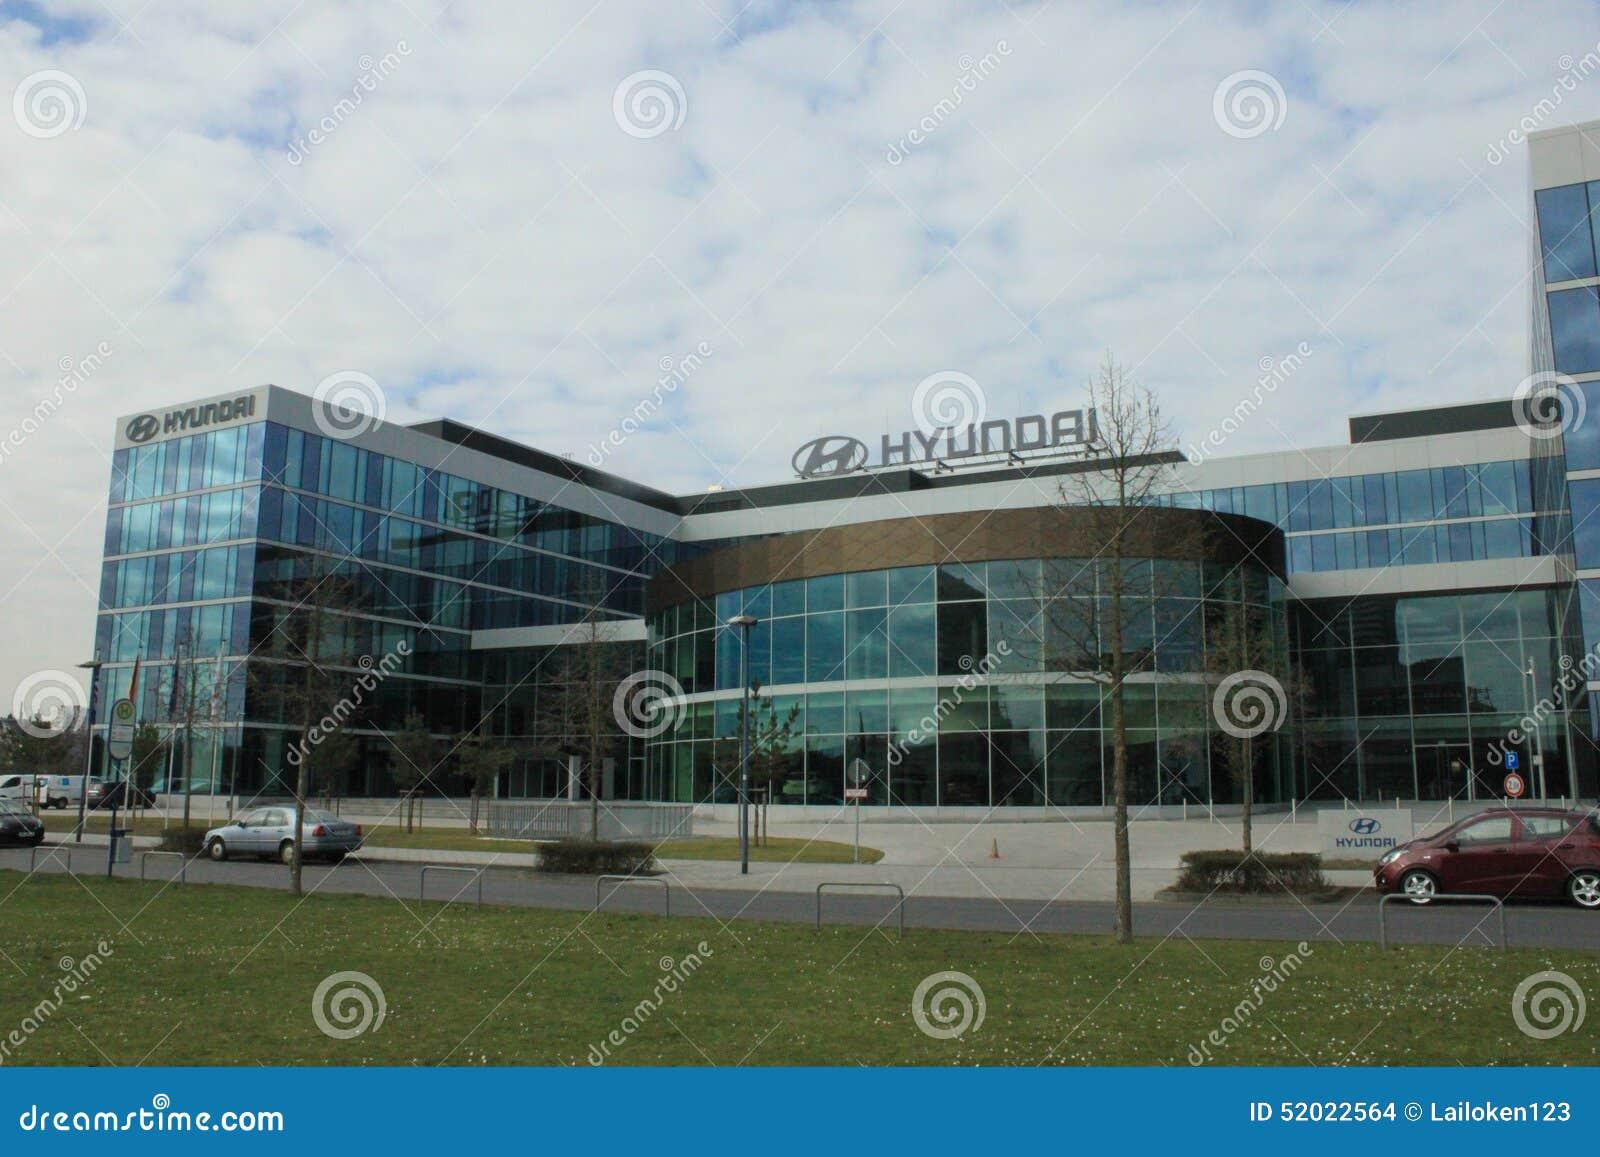 Hyundai europe base editorial stock image image of for Hyundai motor finance corporate office